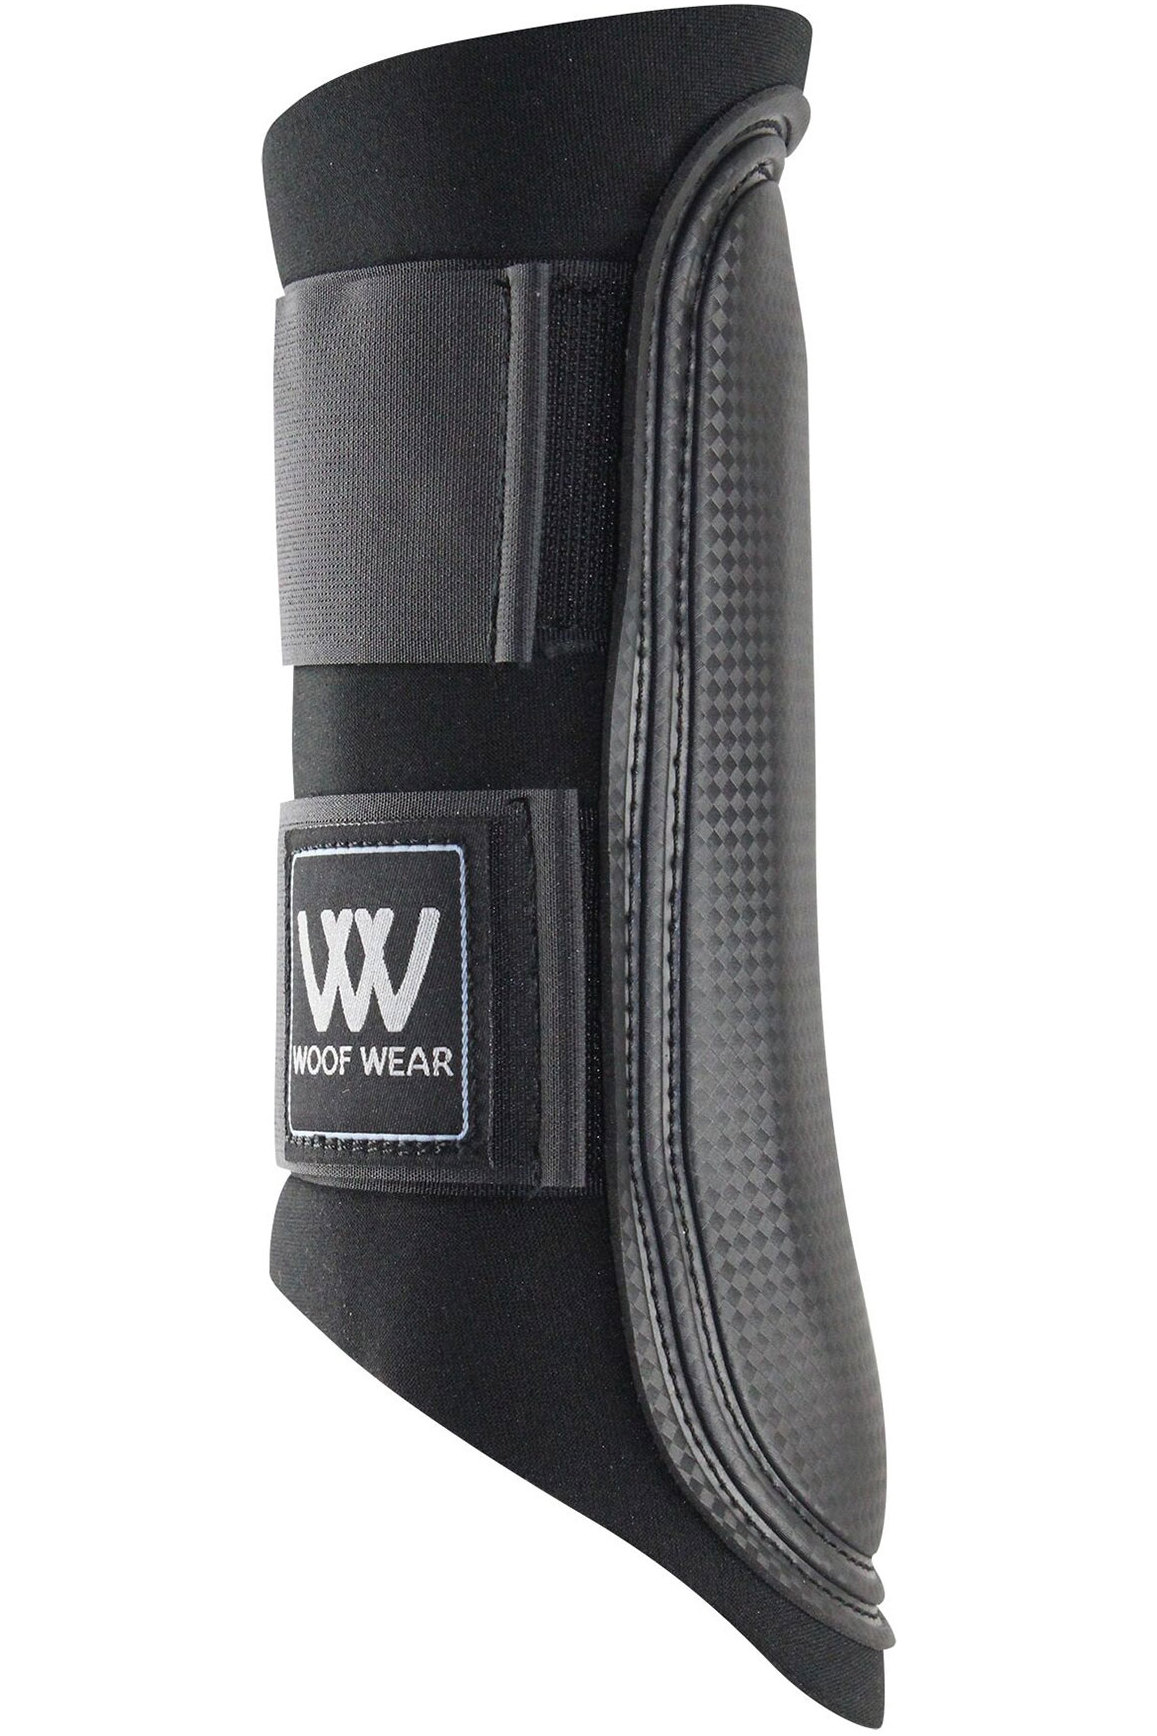 Woof Wear Club Brushing Boot - Black